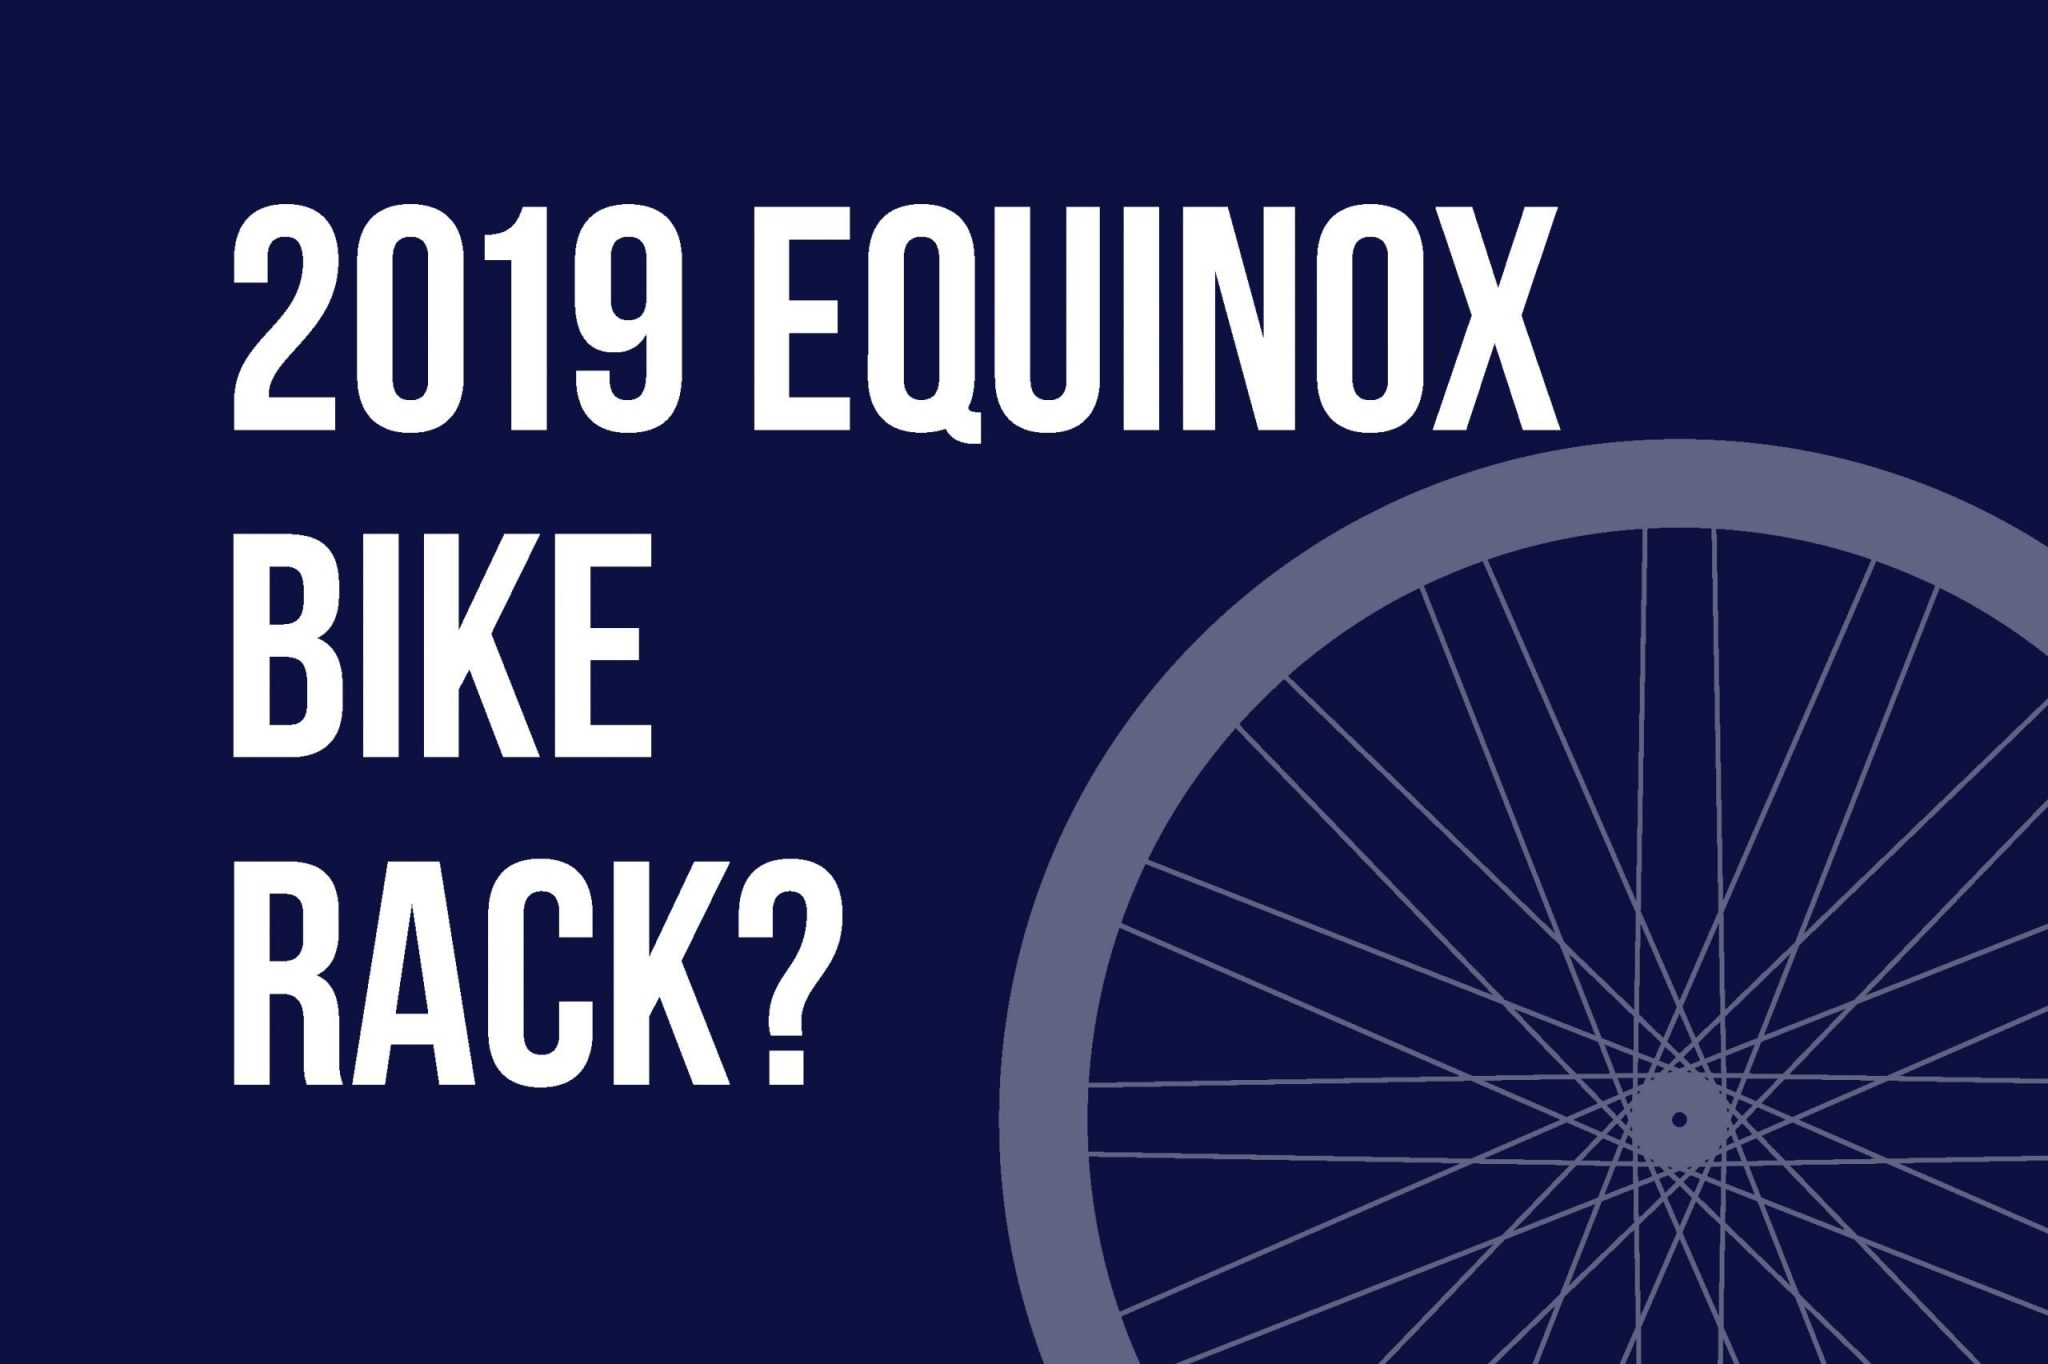 Bike Rack For 2019 Equinox